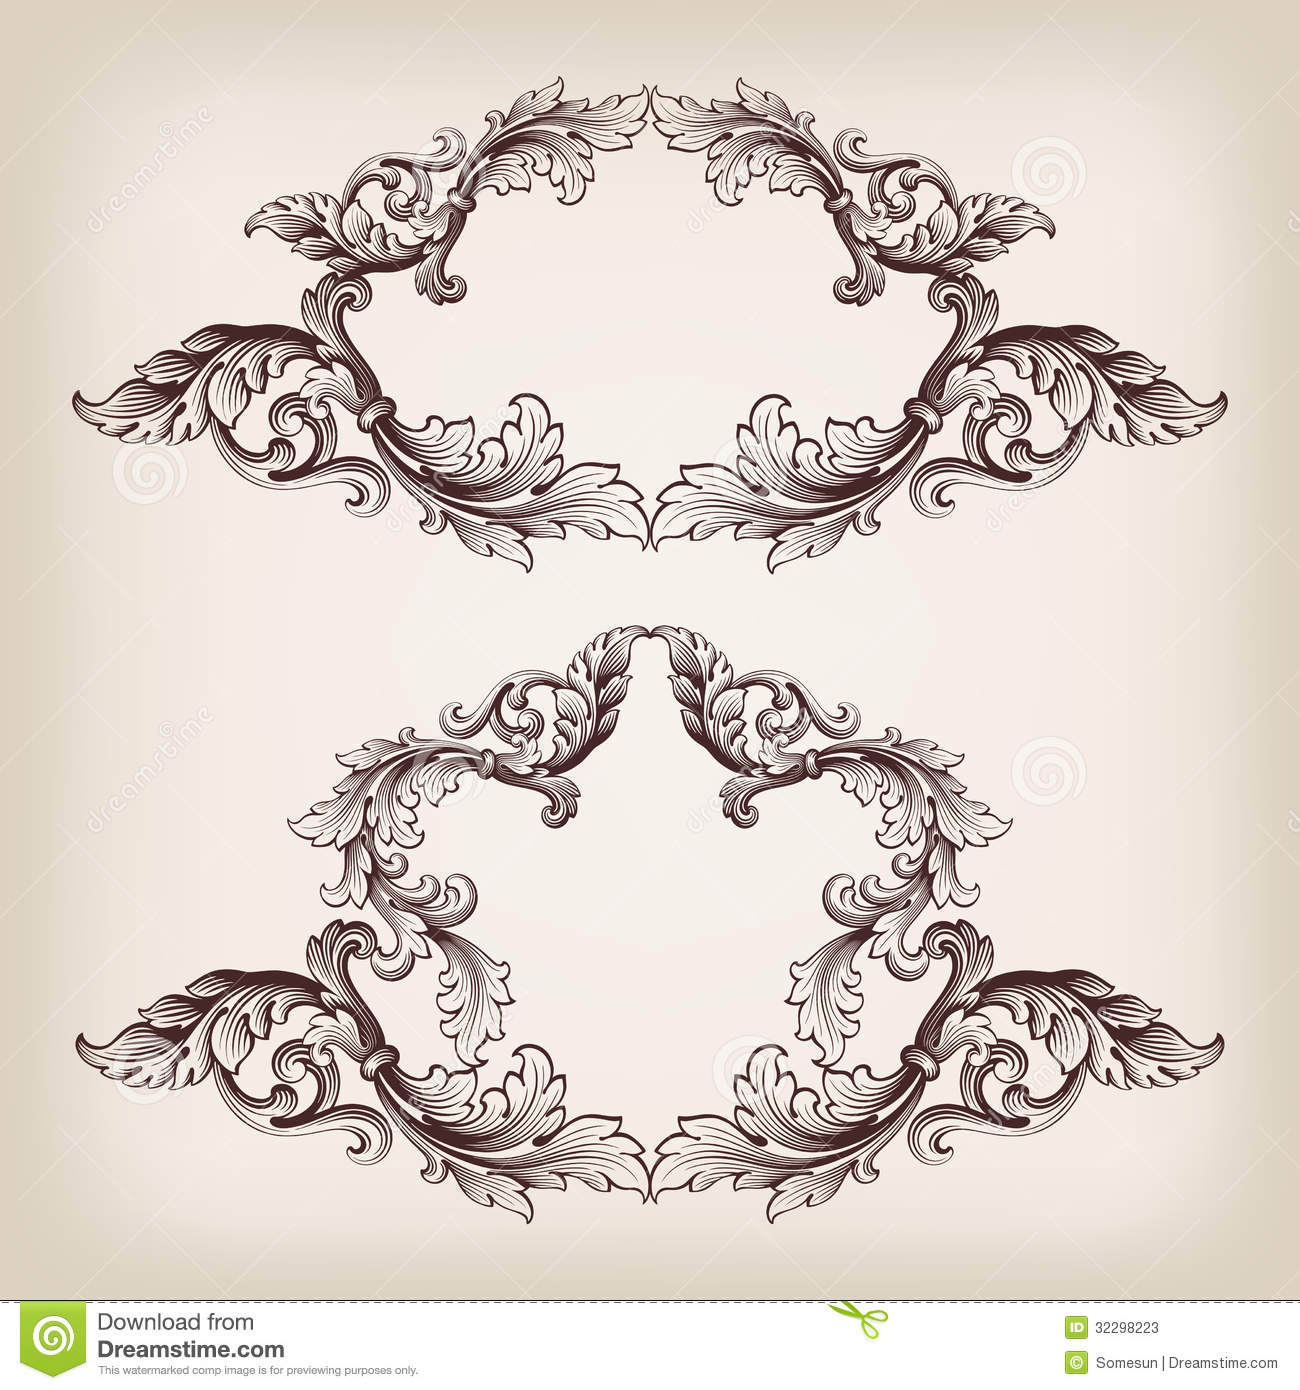 18 baroque frame vector border images vector corner for Filigree border designs